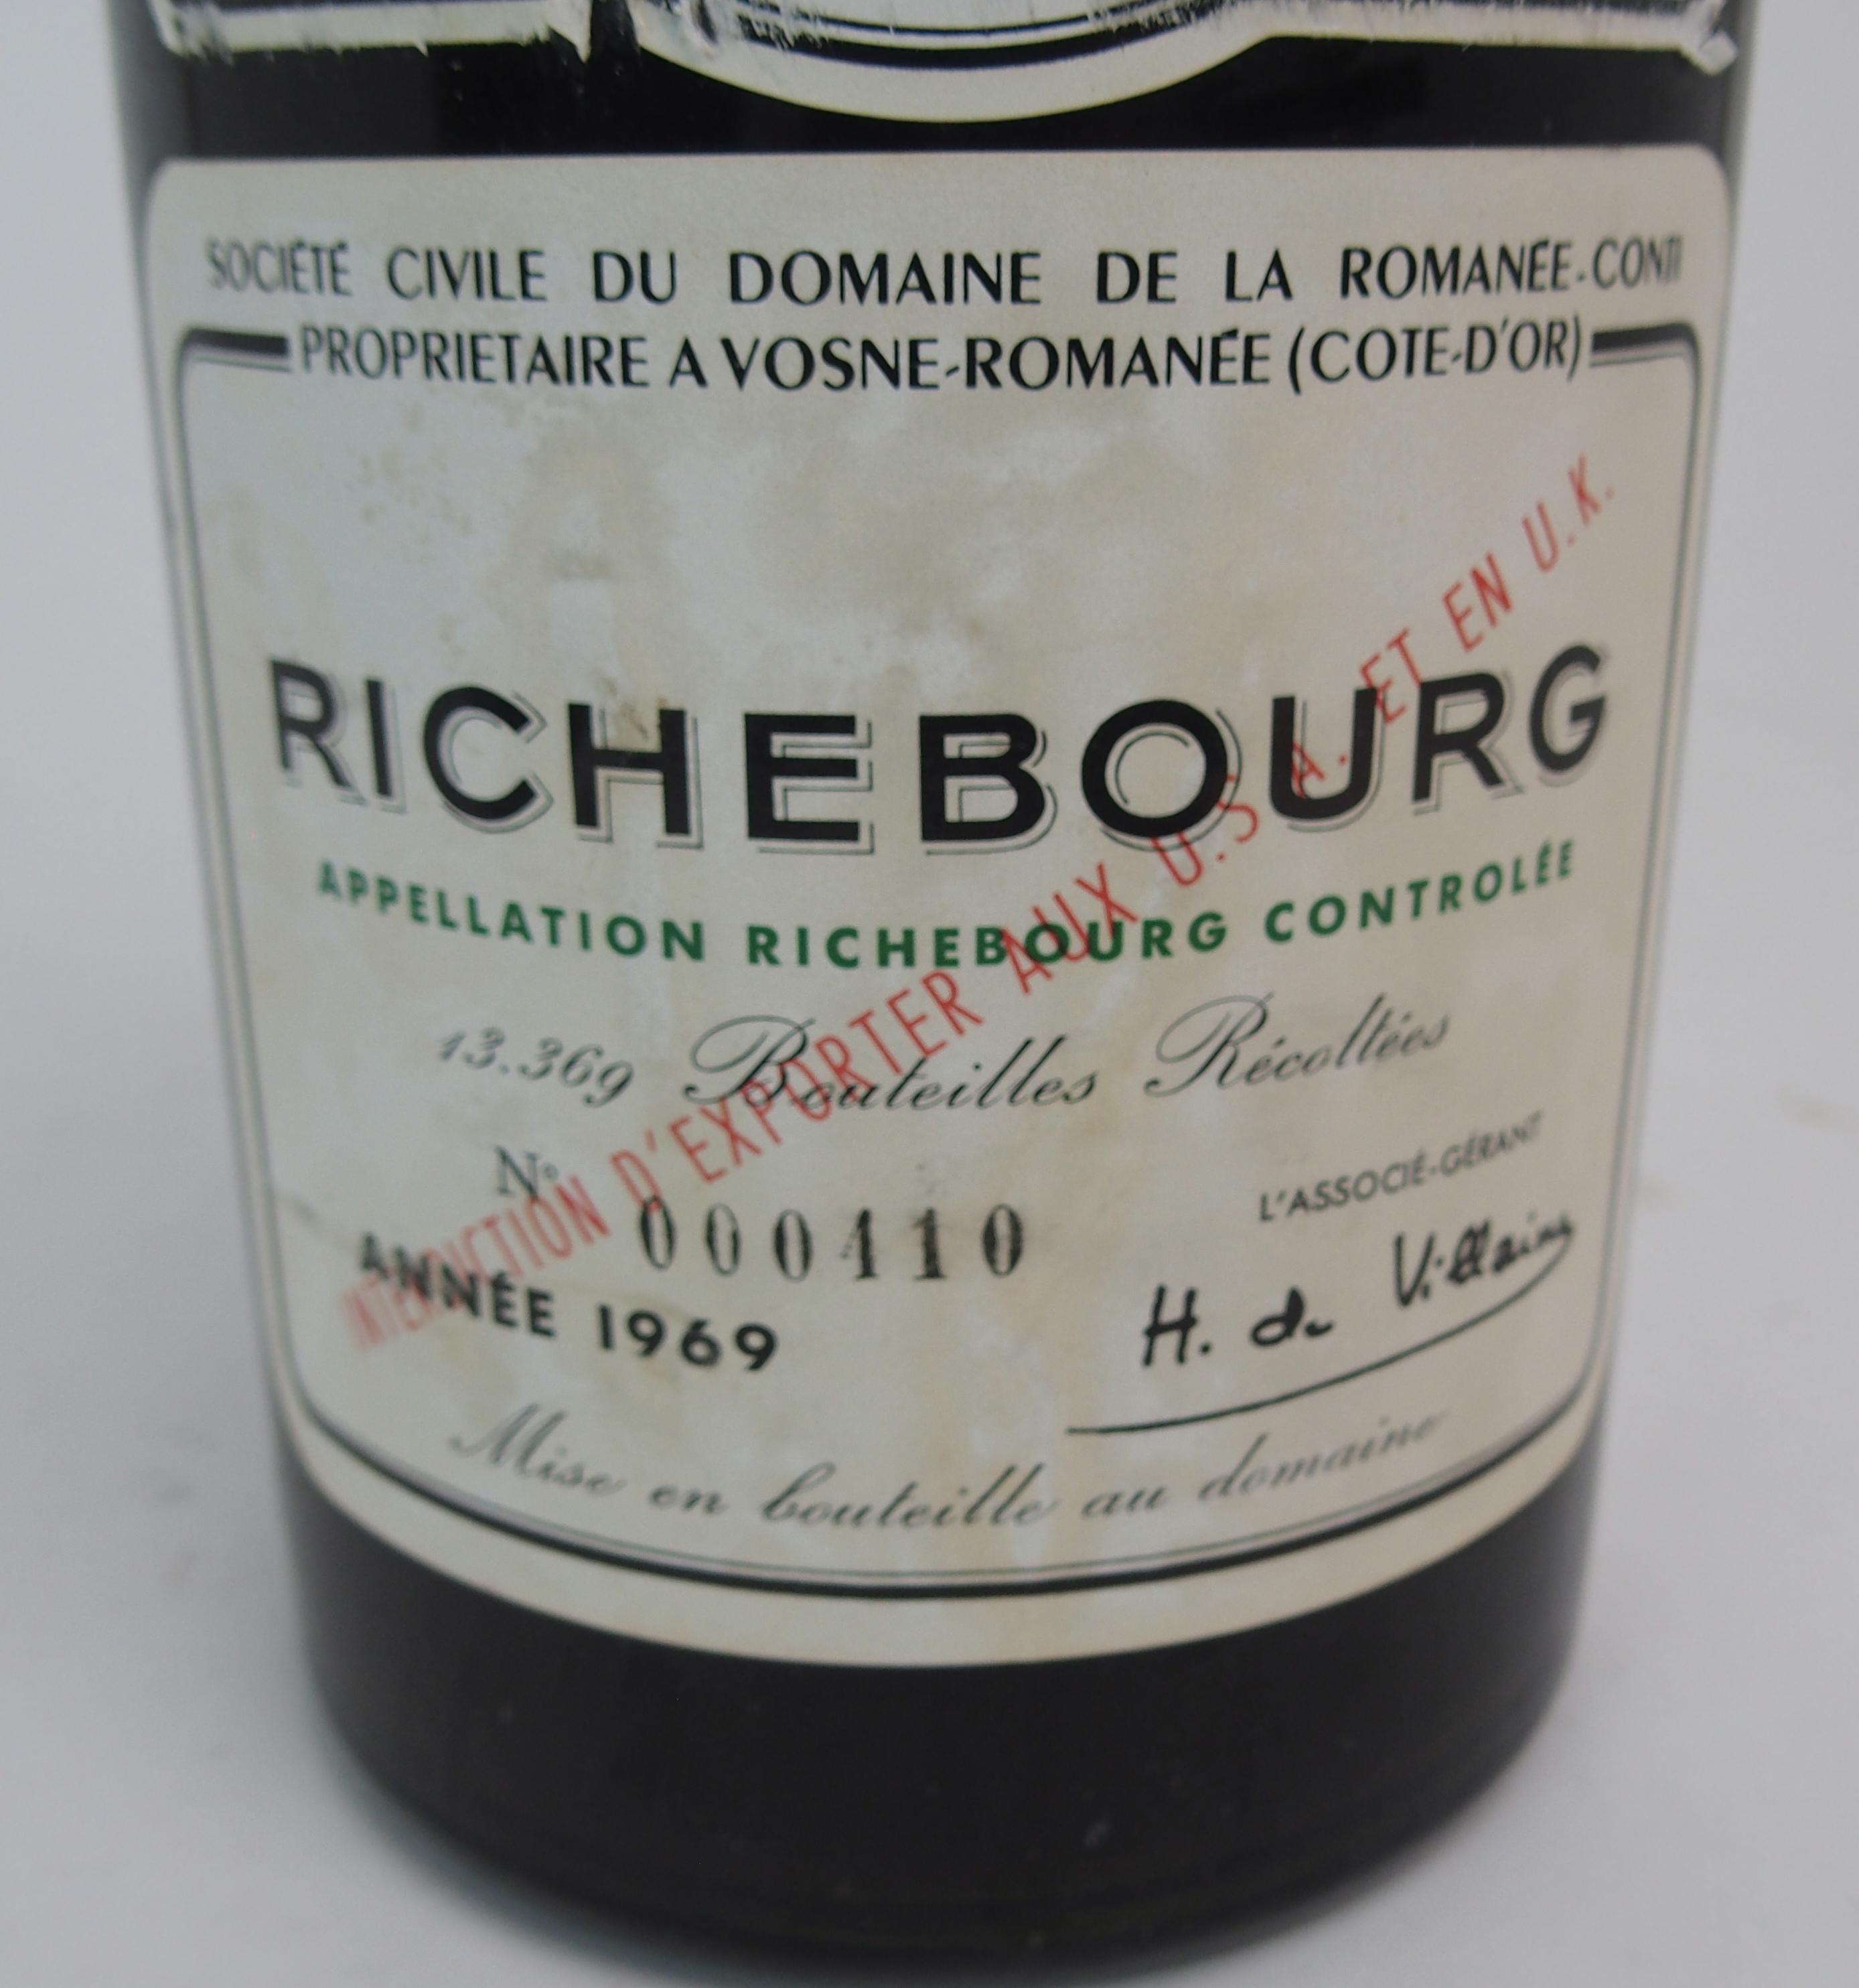 A MAGNUM OF RICHBOURG DOMAINE DE LA ROMANEE-CONTI Bottle No.000410, 1969 Condition Report: Available - Image 3 of 6